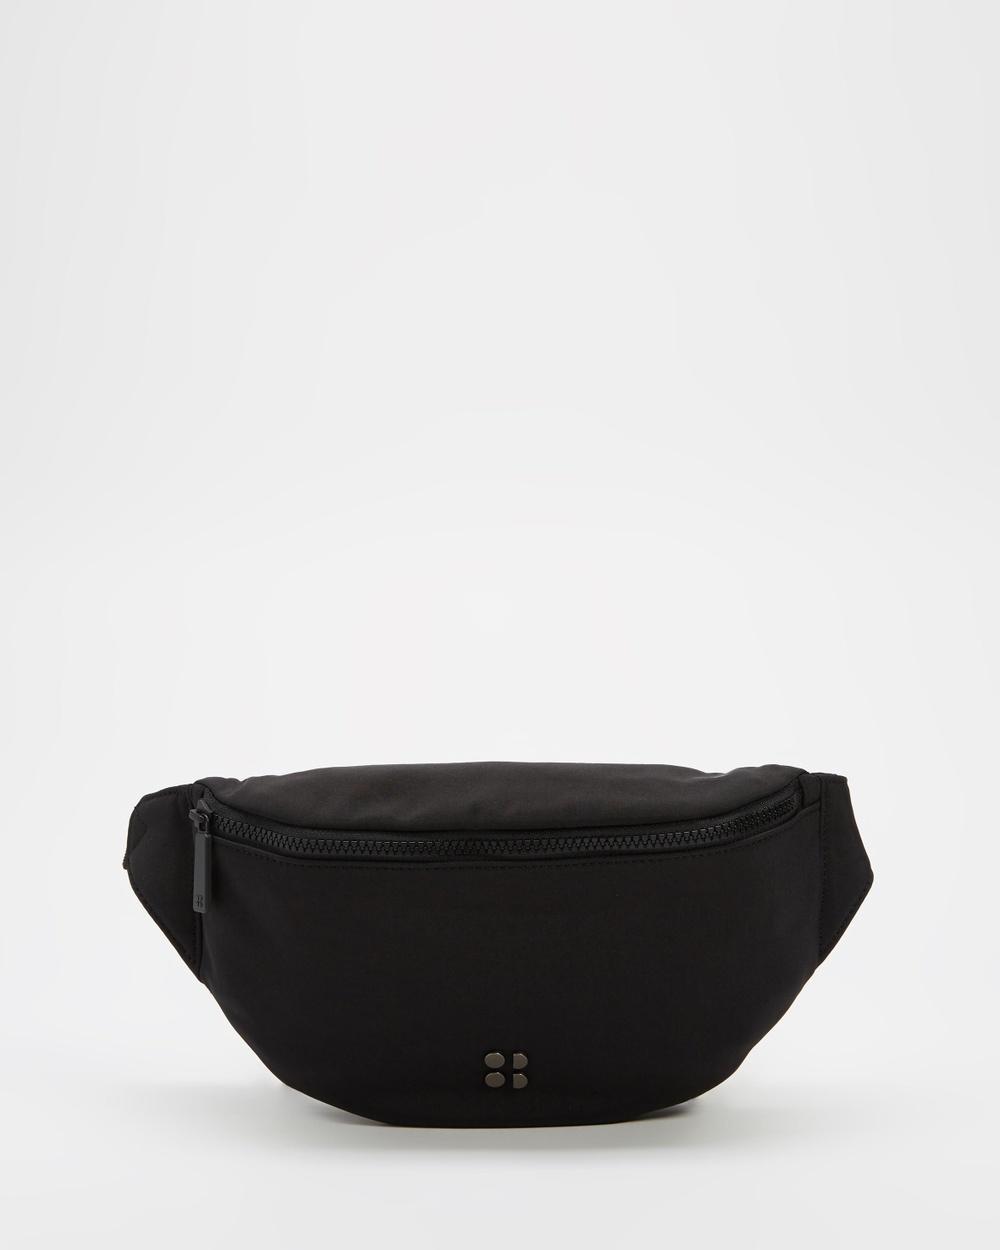 Sweaty Betty Utility Bum Bag Bags Black